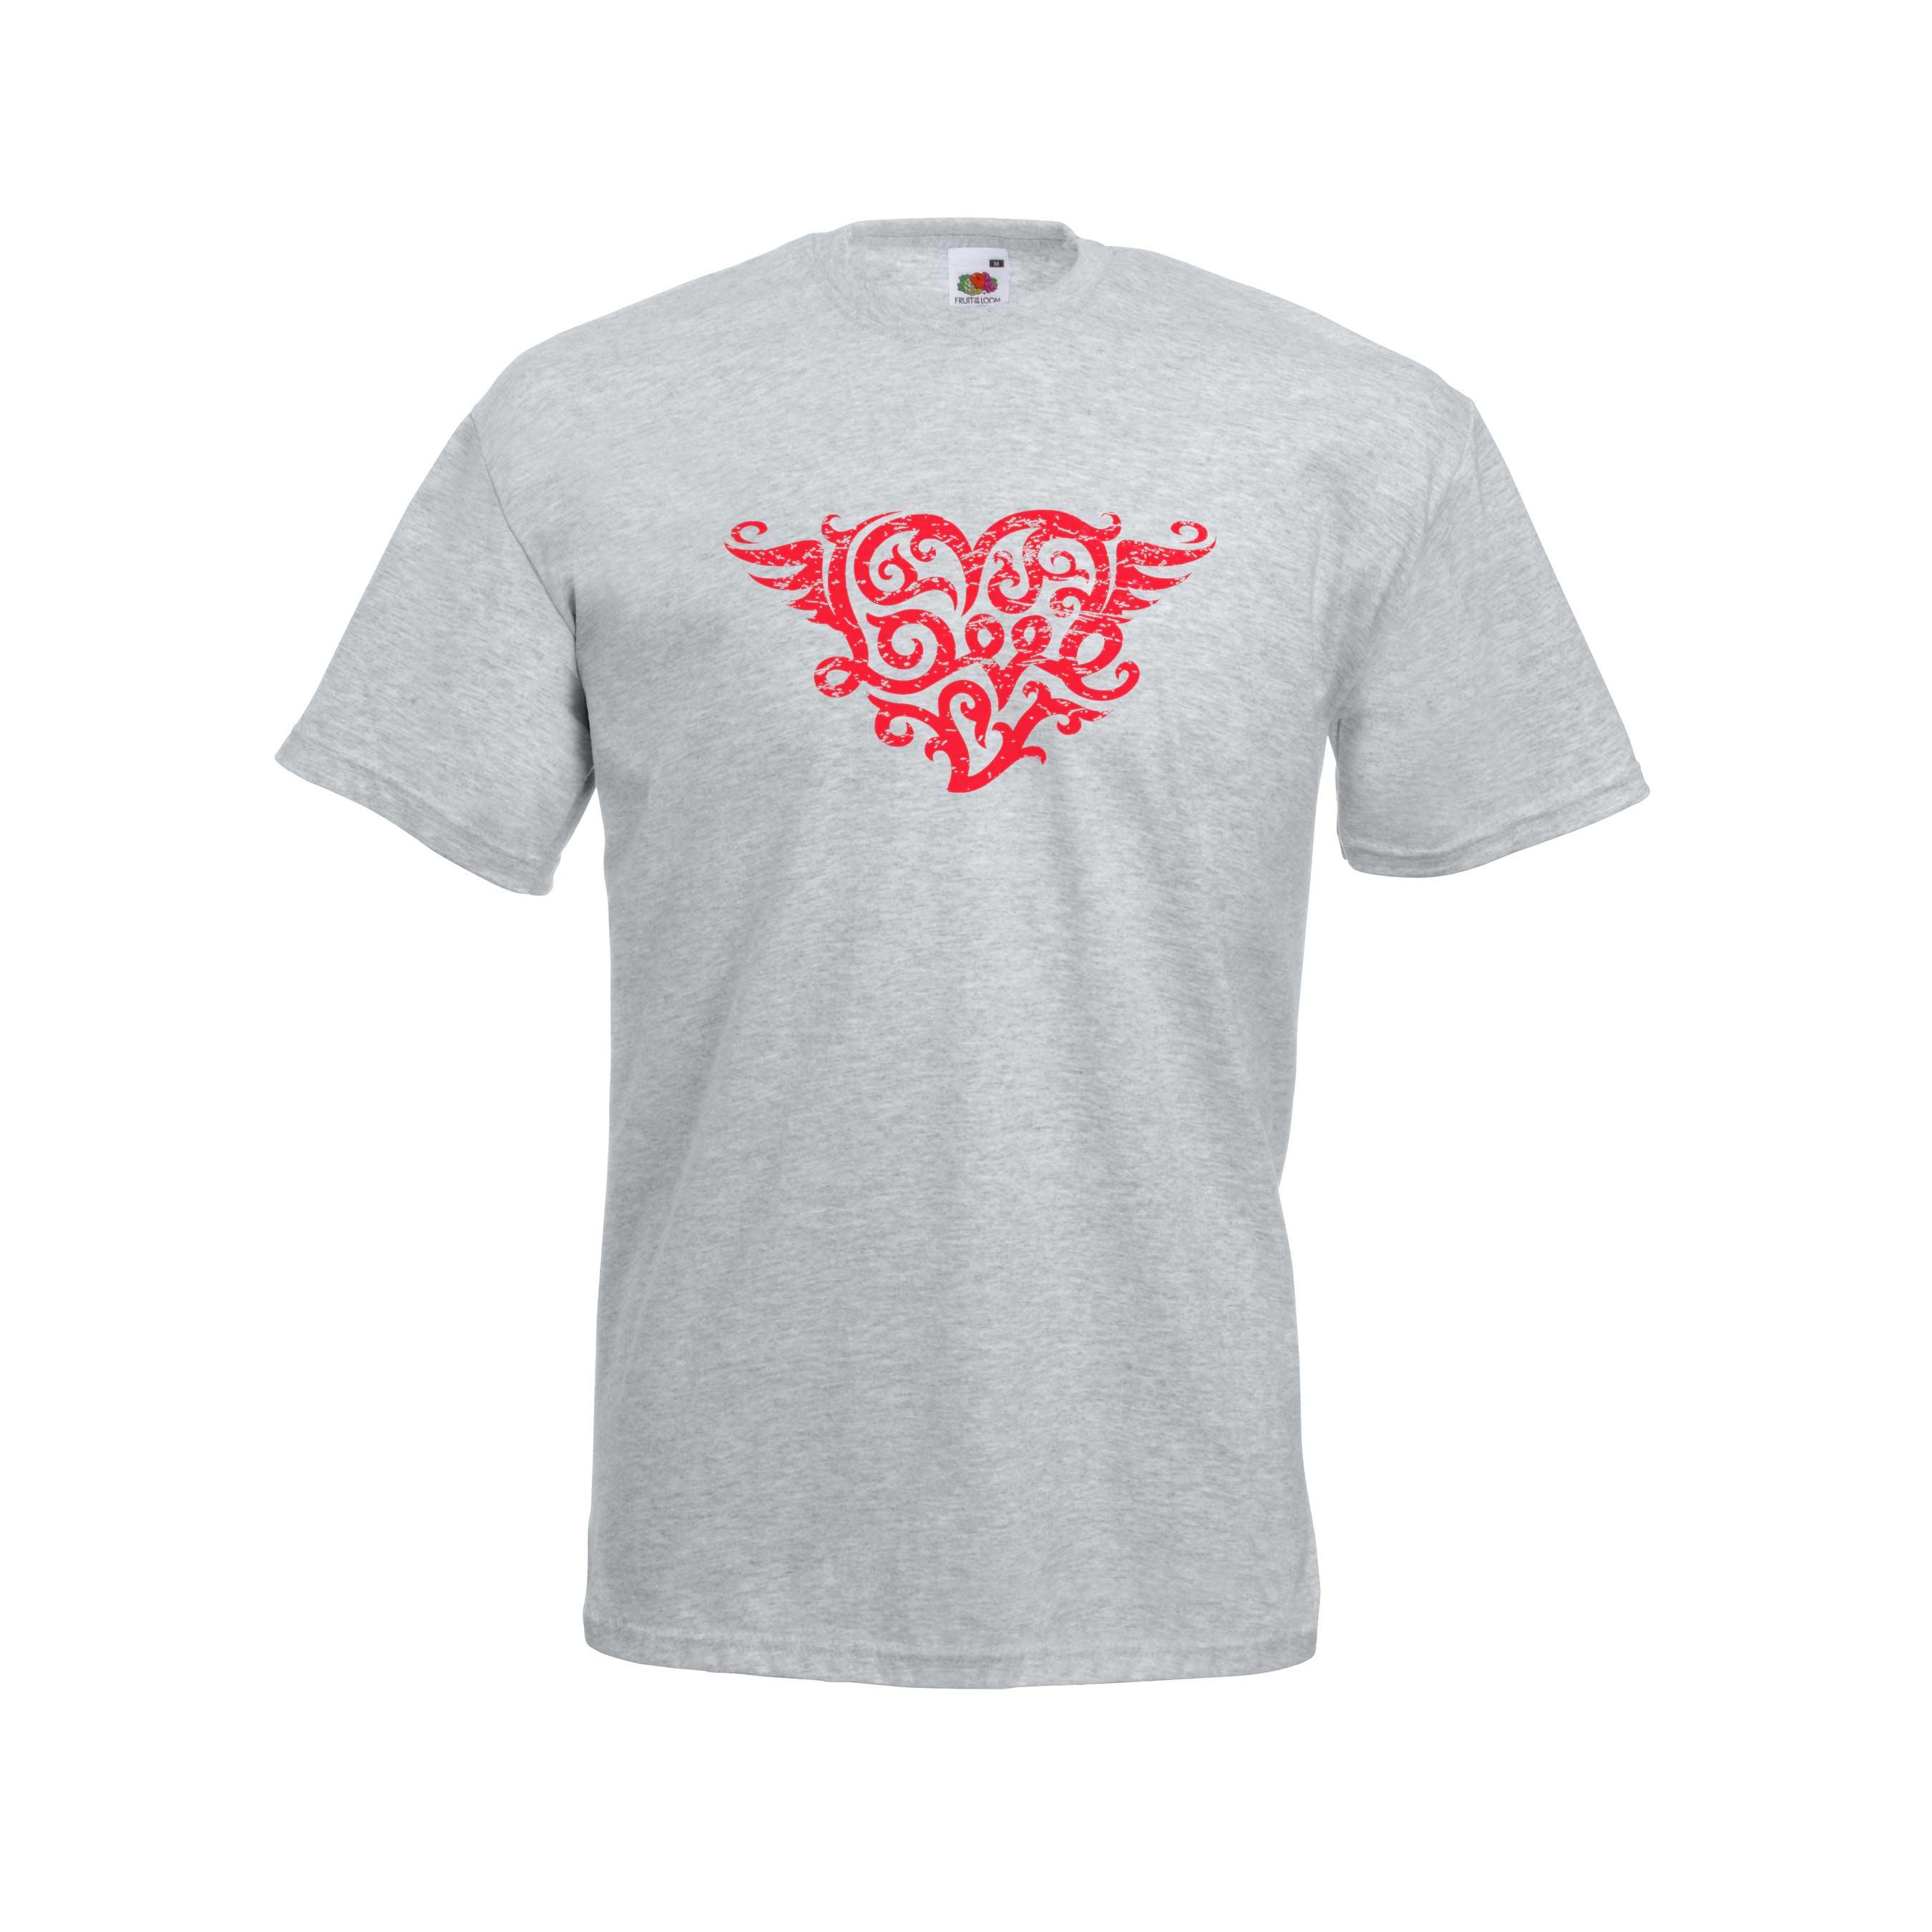 Love design for t-shirt, hoodie & sweatshirt